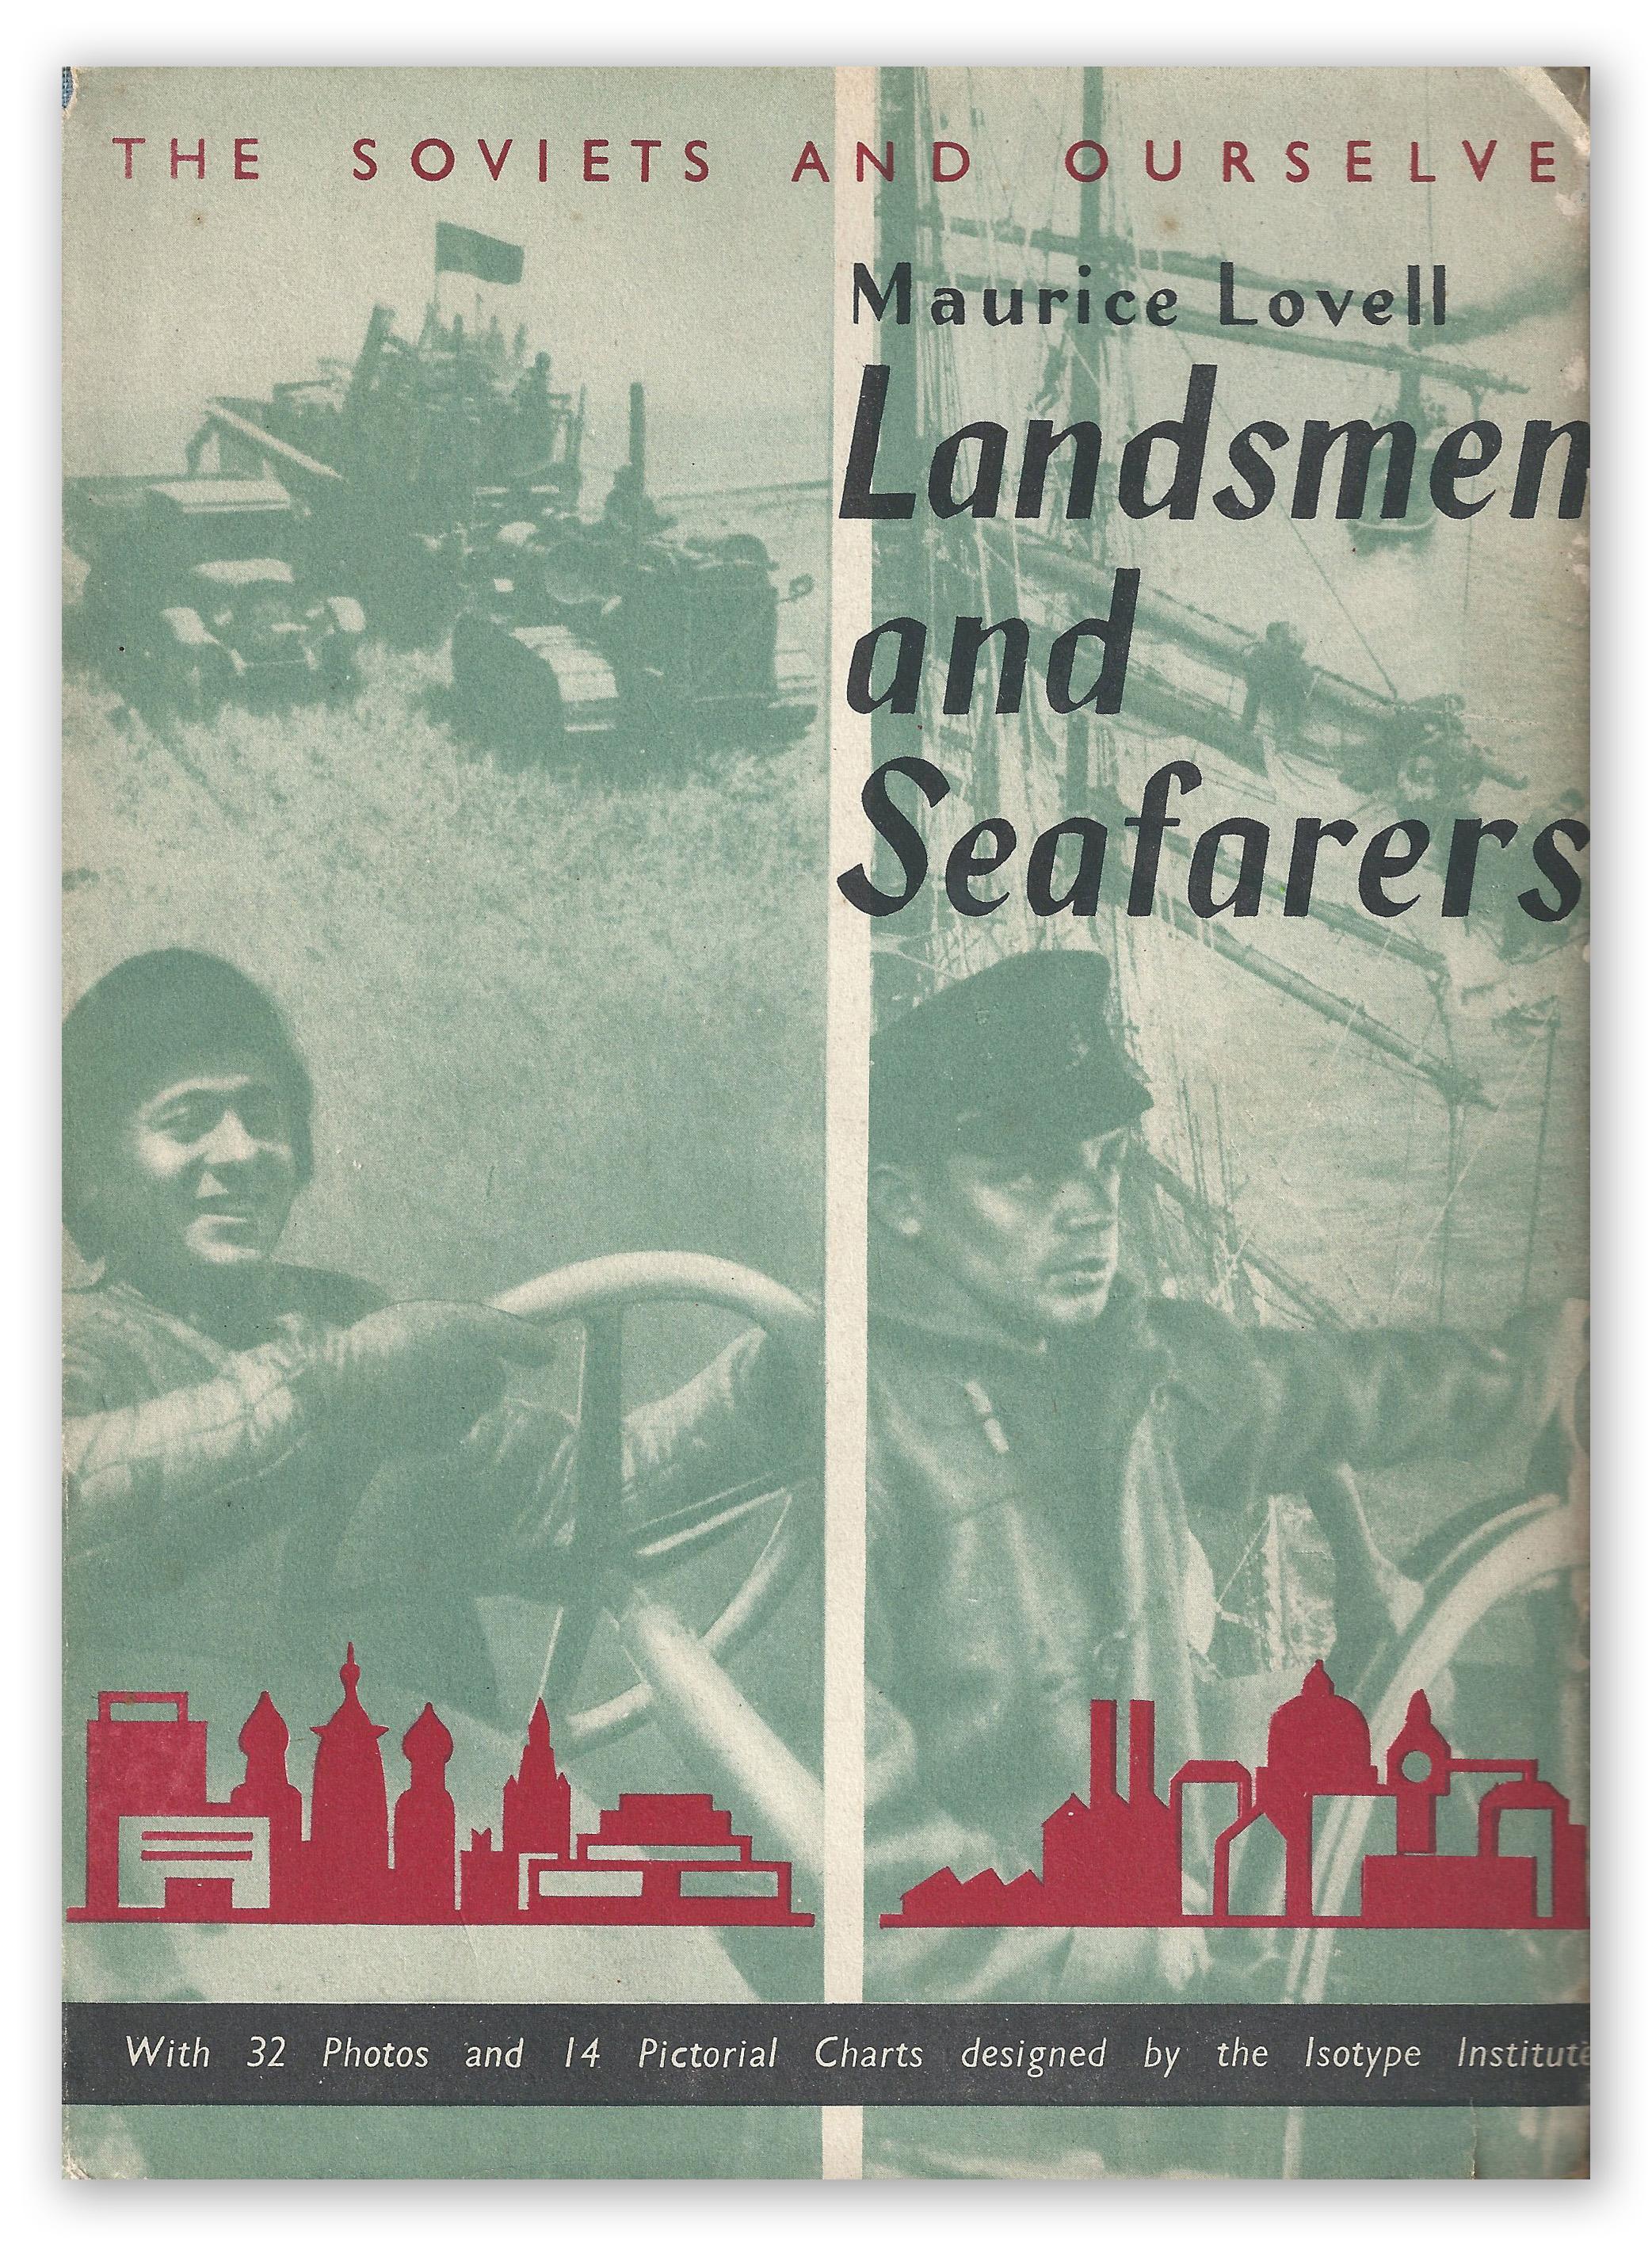 Landsmen and Seamen by Maurice Lovell